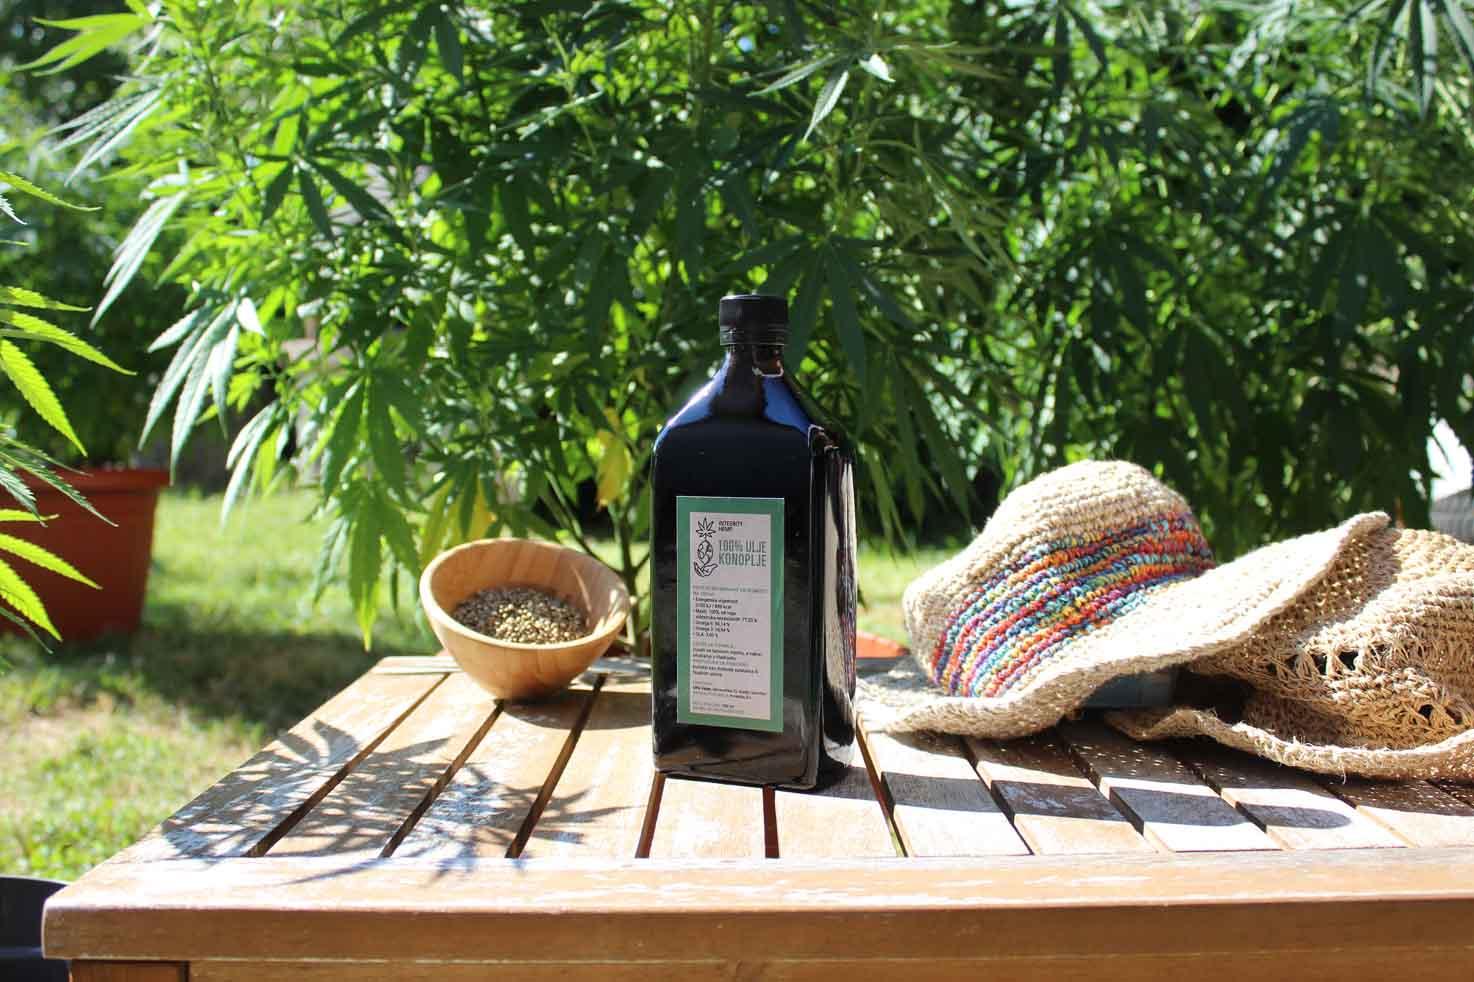 integrity hemp cbd ulje na stolu okruzeno prirodom